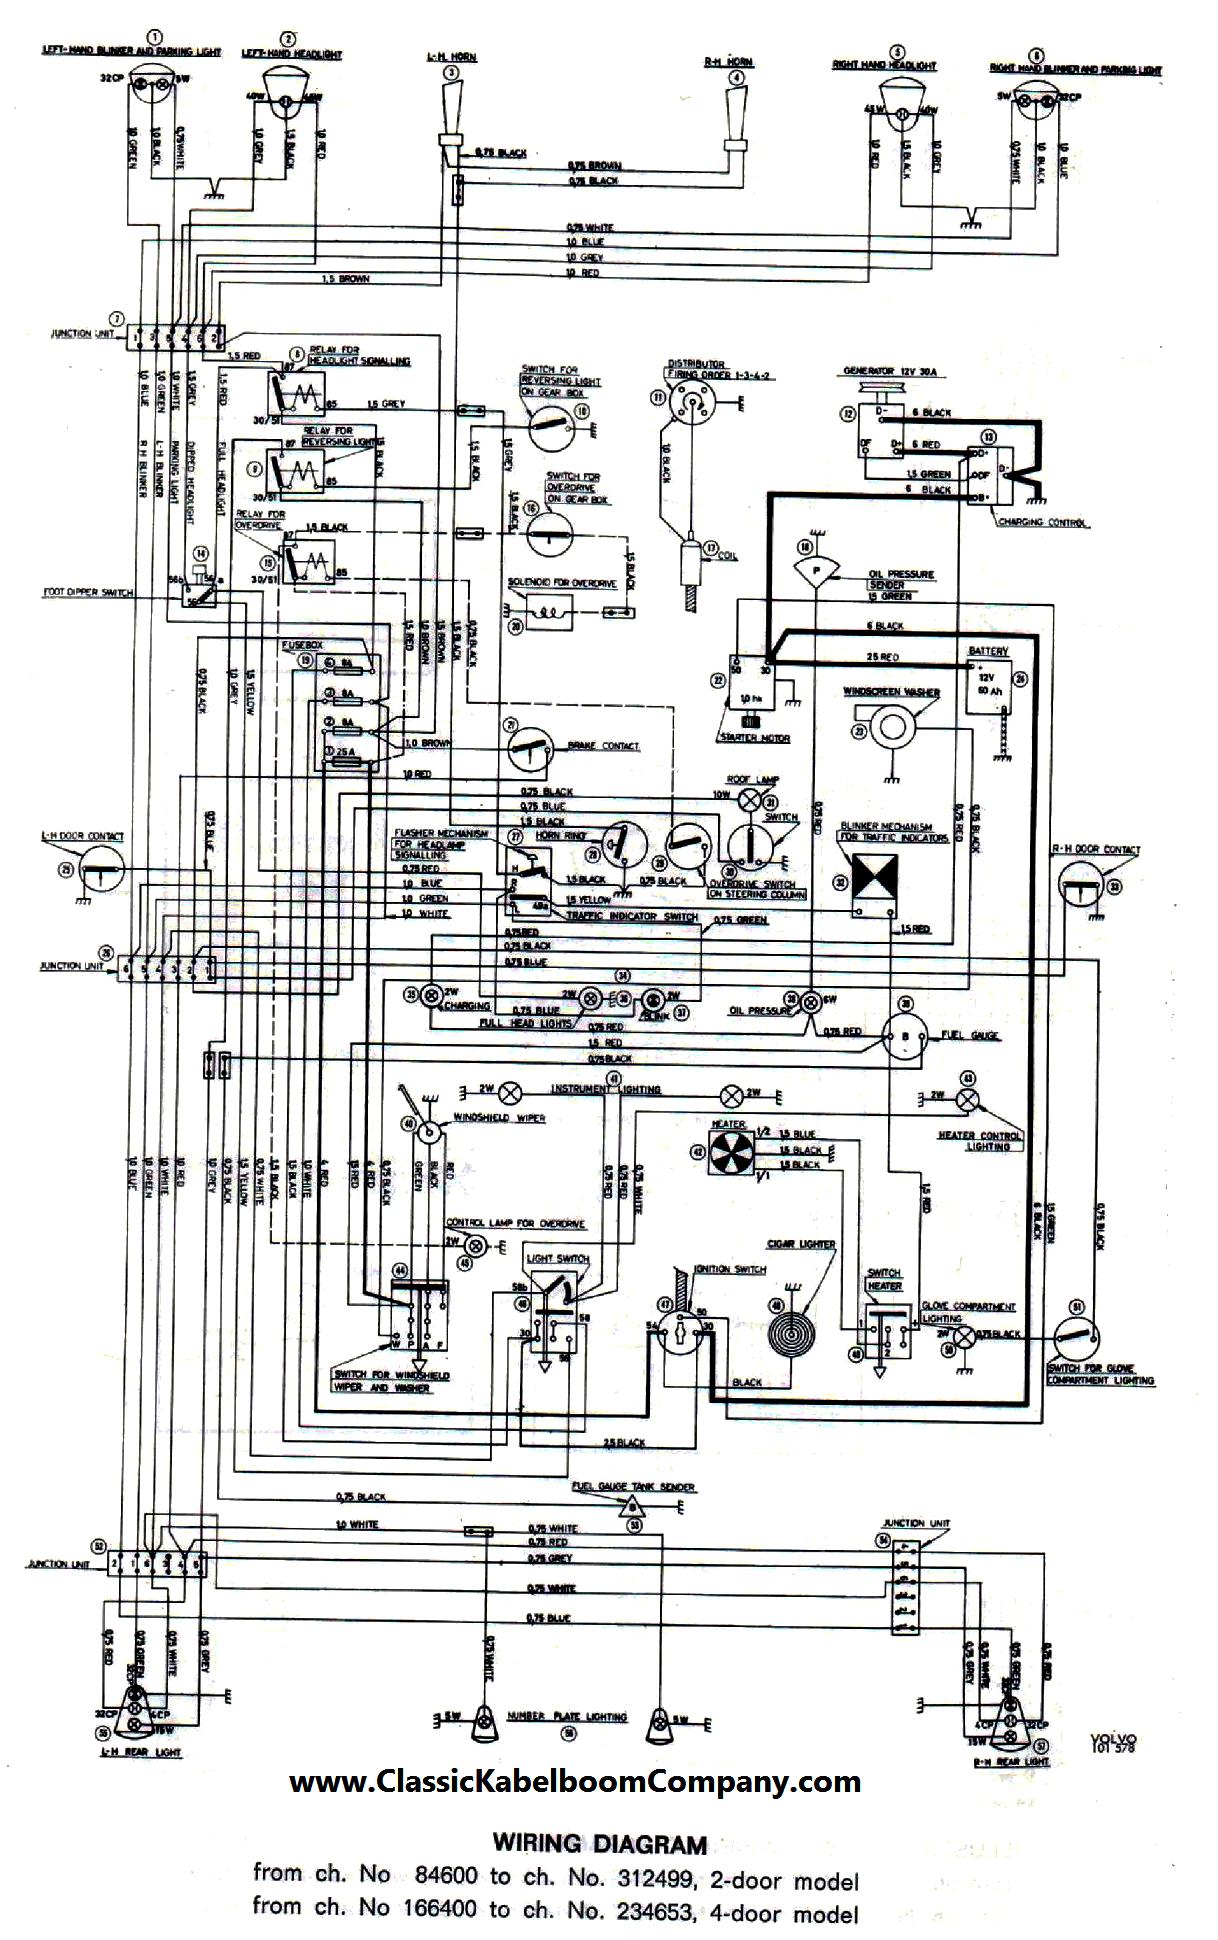 Classic Kabelboom Company - Elektrisch bedrading schema Volvo ...